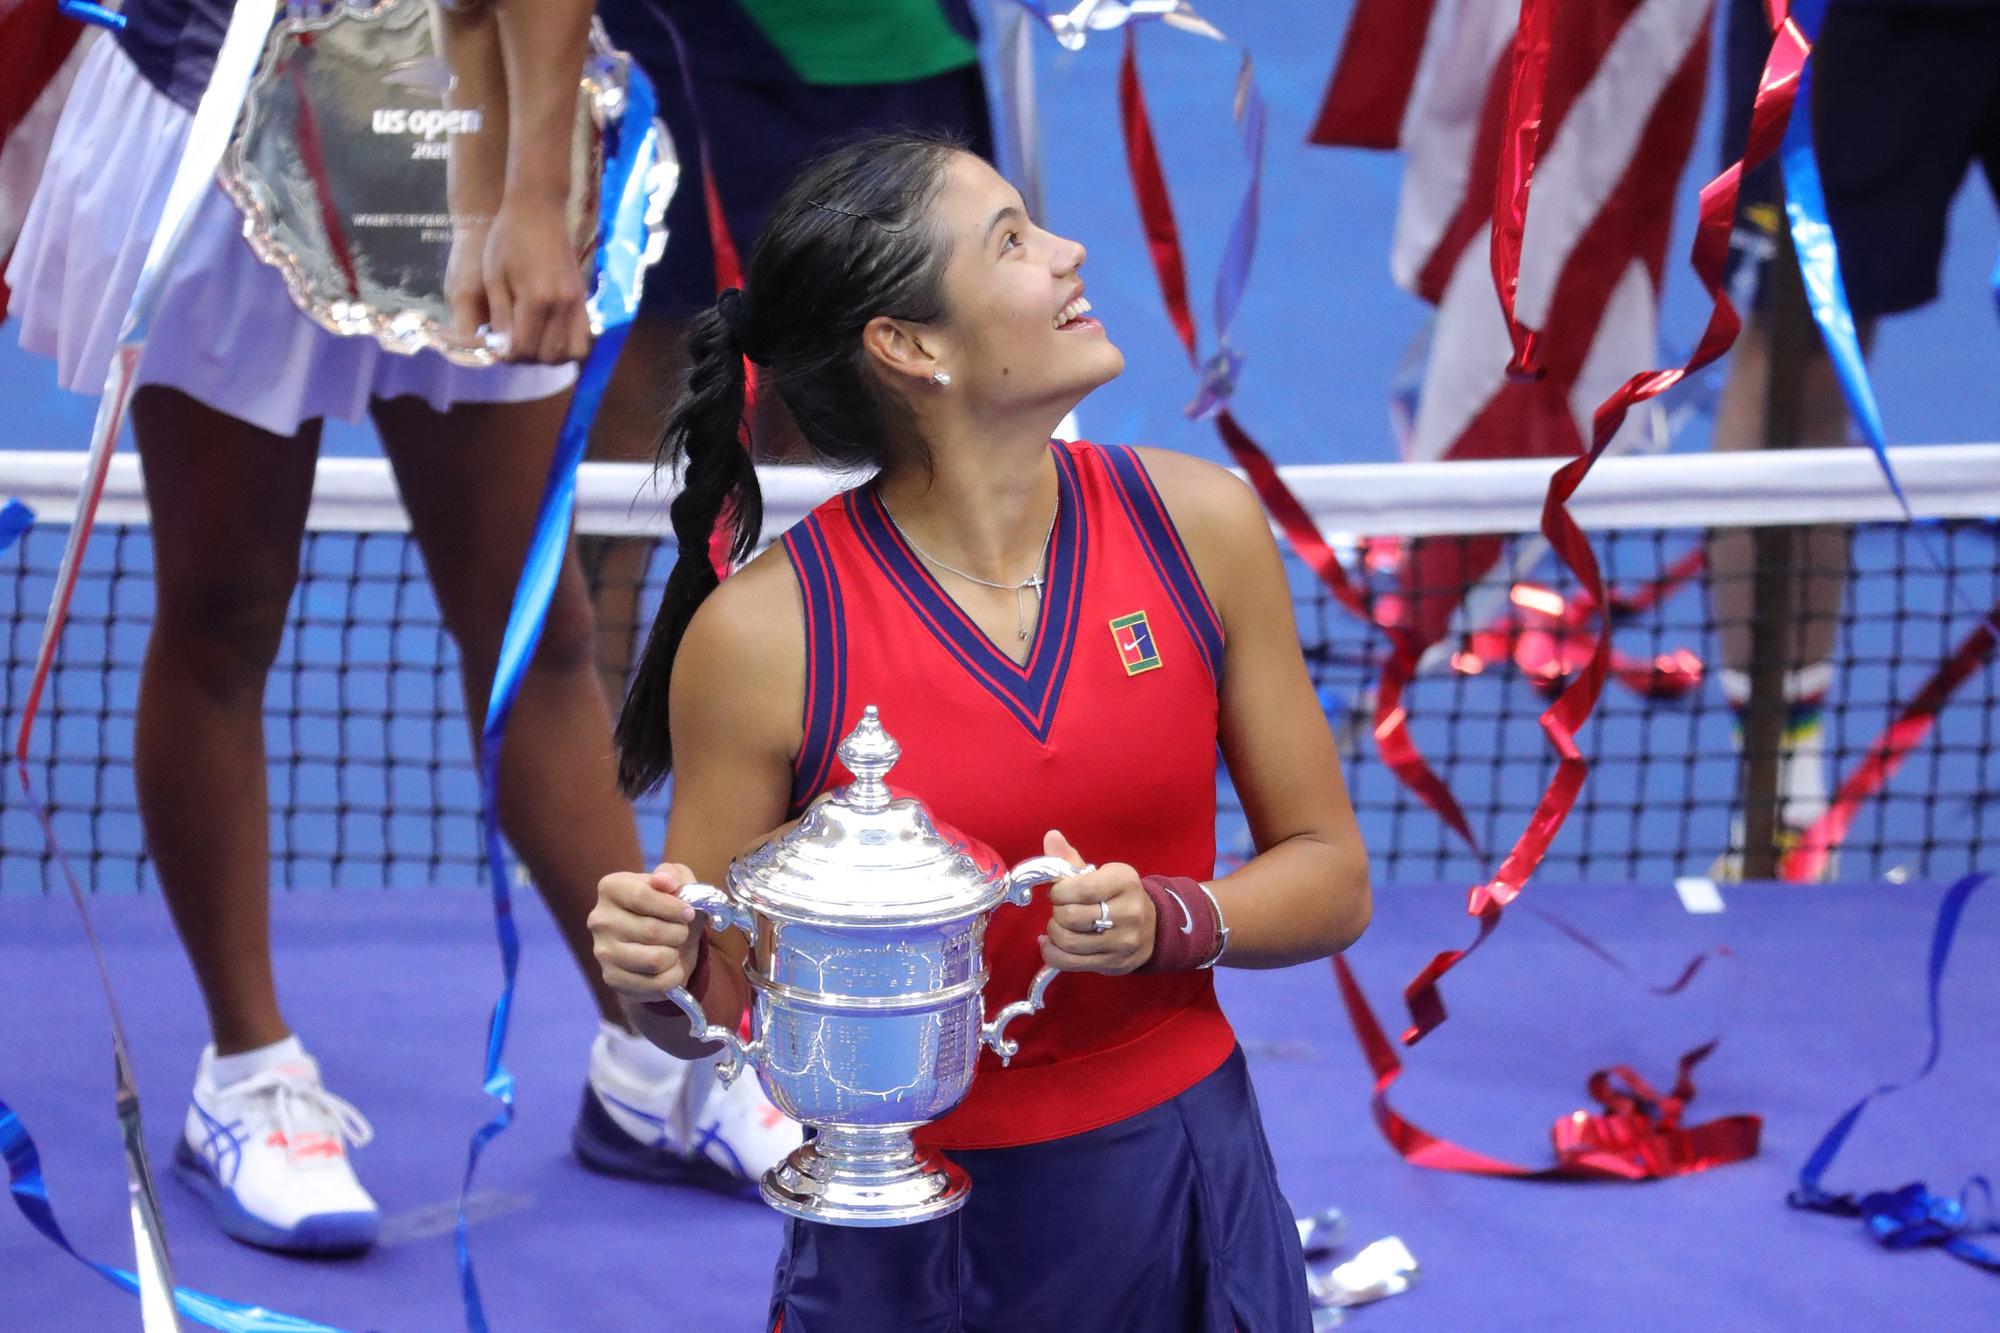 US Open: Raducanu nouveau joyau de la couronne et du tennis féminin, BELGA